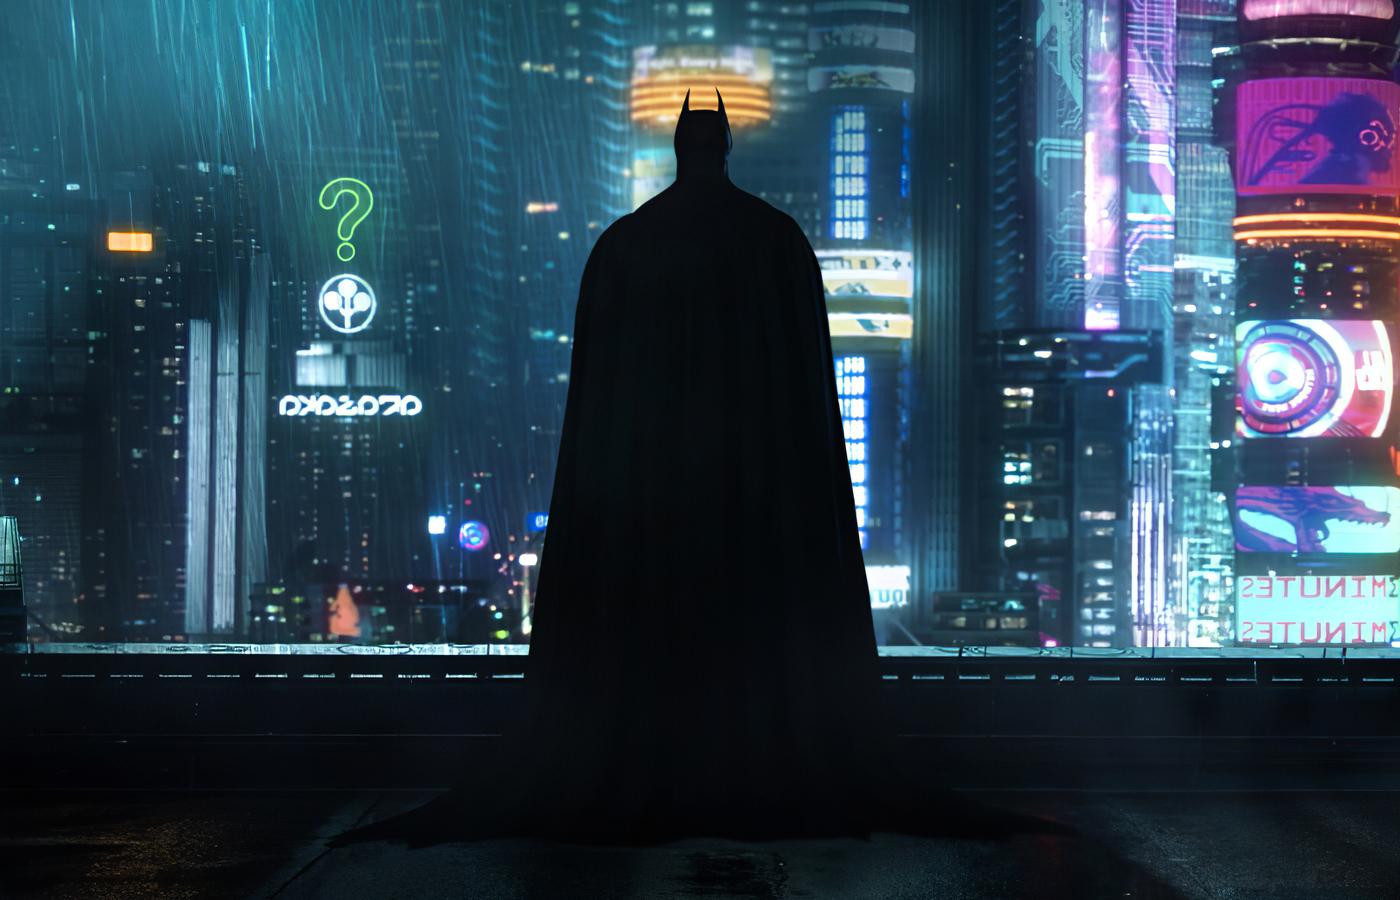 neon-gotham-batman-4k-1t.jpg